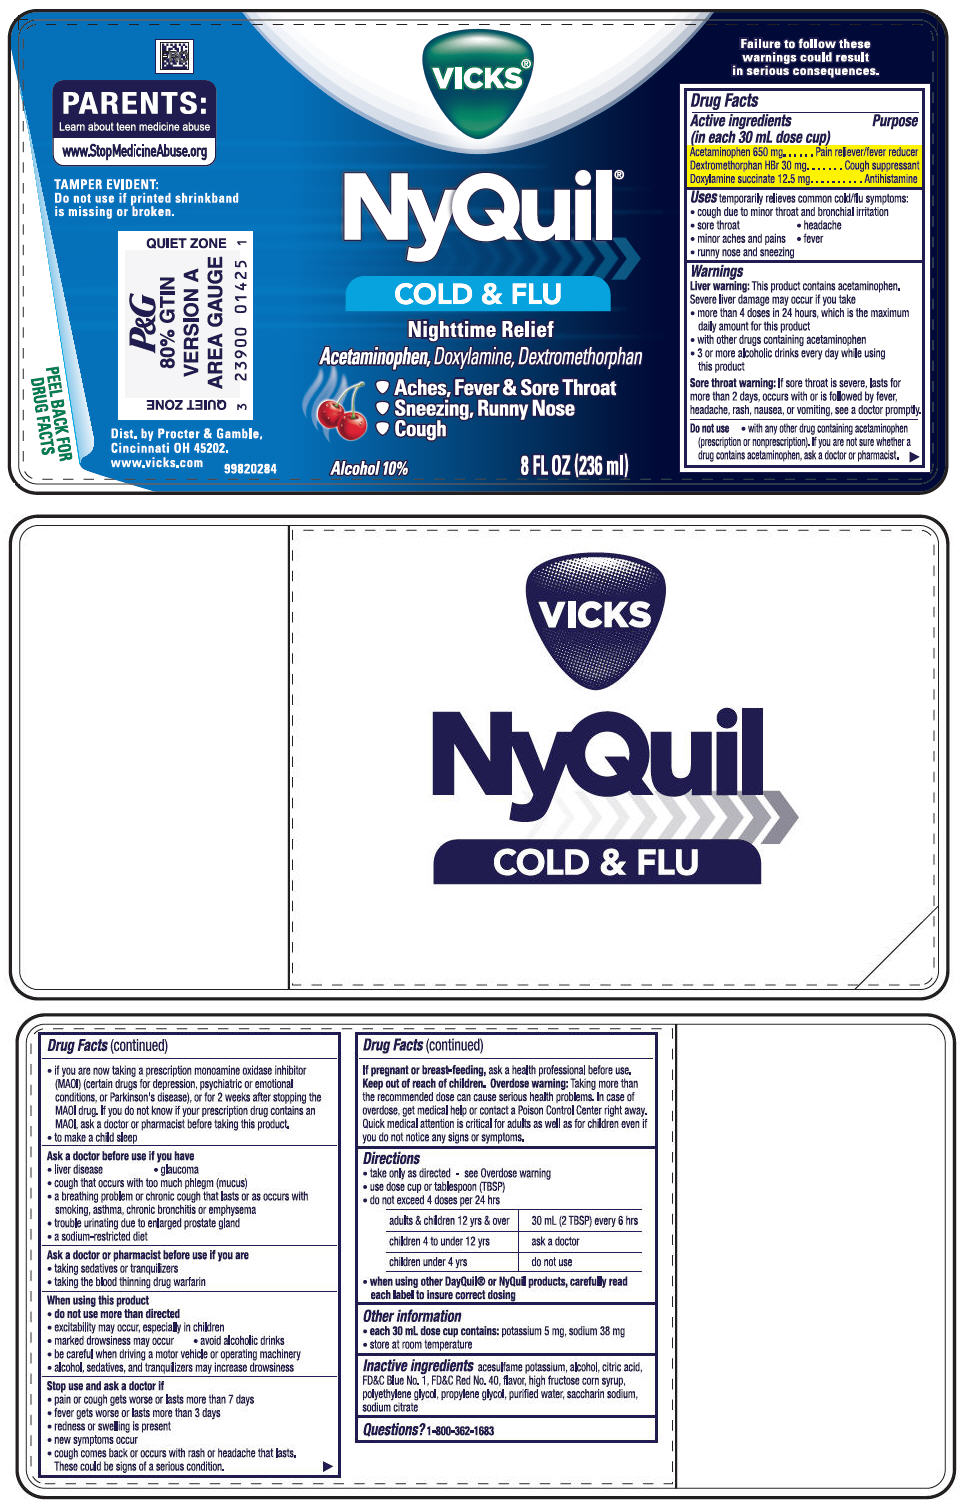 PRINCIPAL DISPLAY PANEL - 360 ml Bottle Label